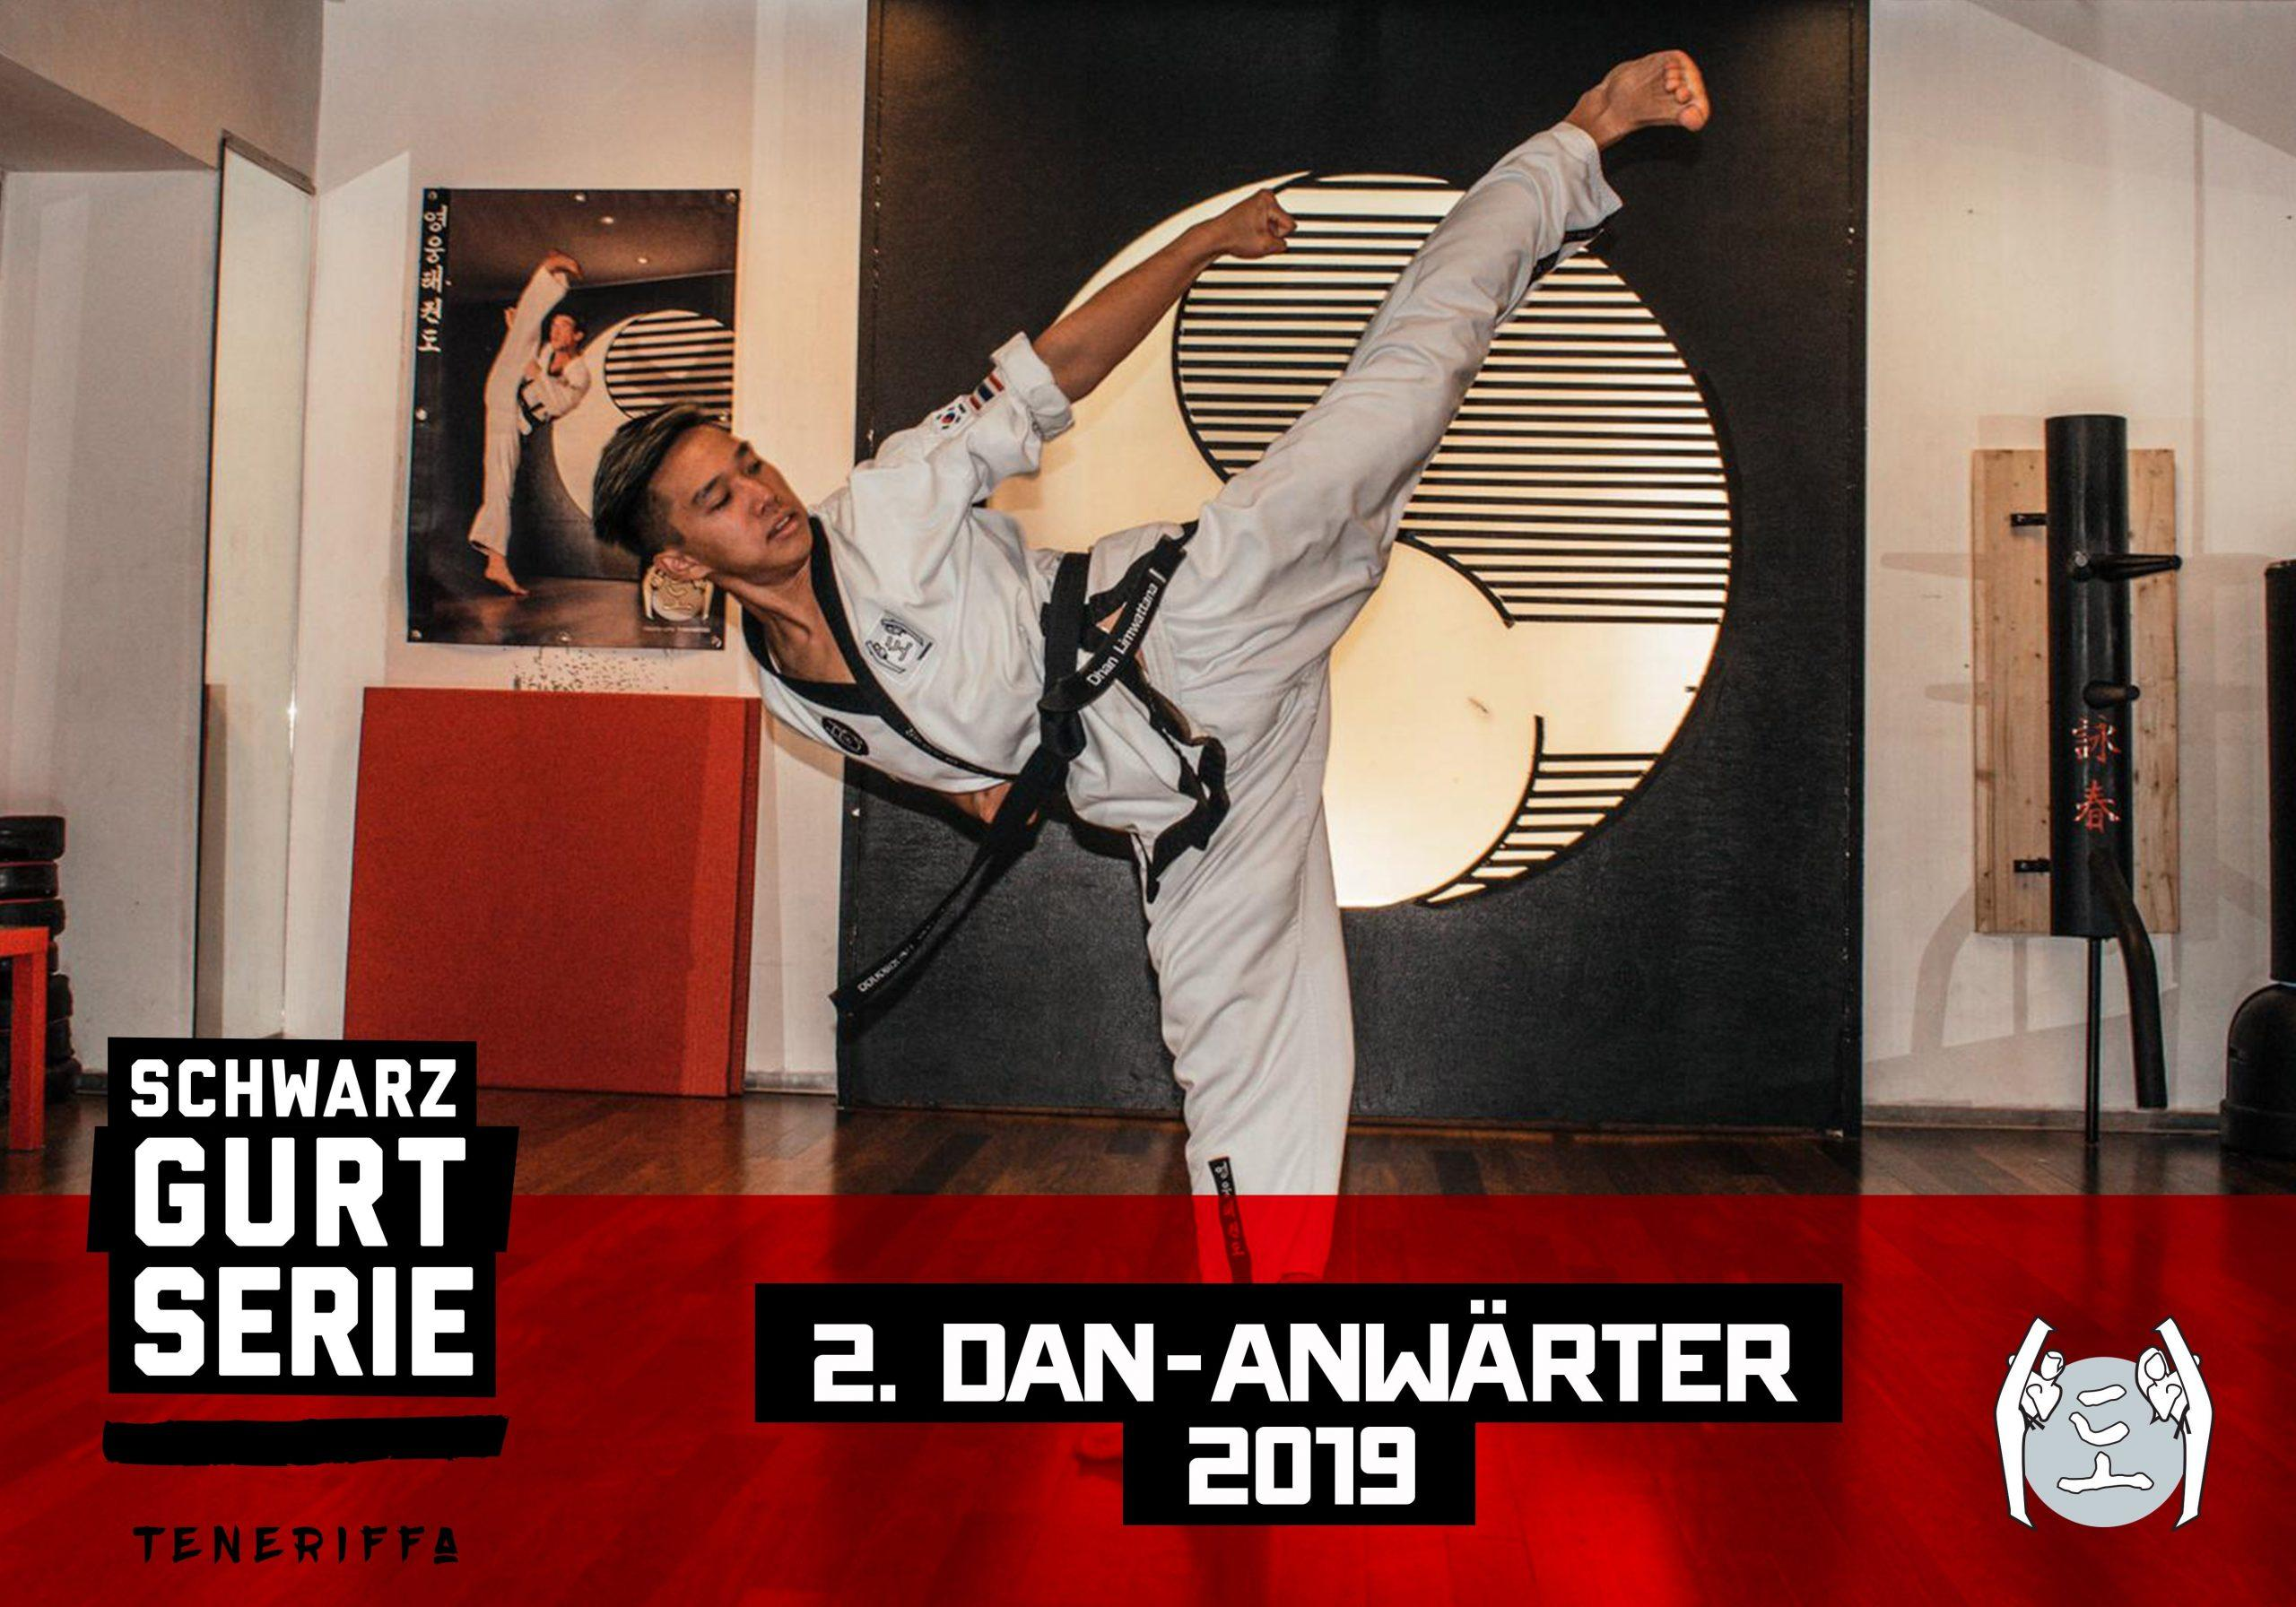 YOUNG-UNG Taekwondo Schwarzgurt-Serie Dhan Limwattana Training Teneriffa Kampfsport